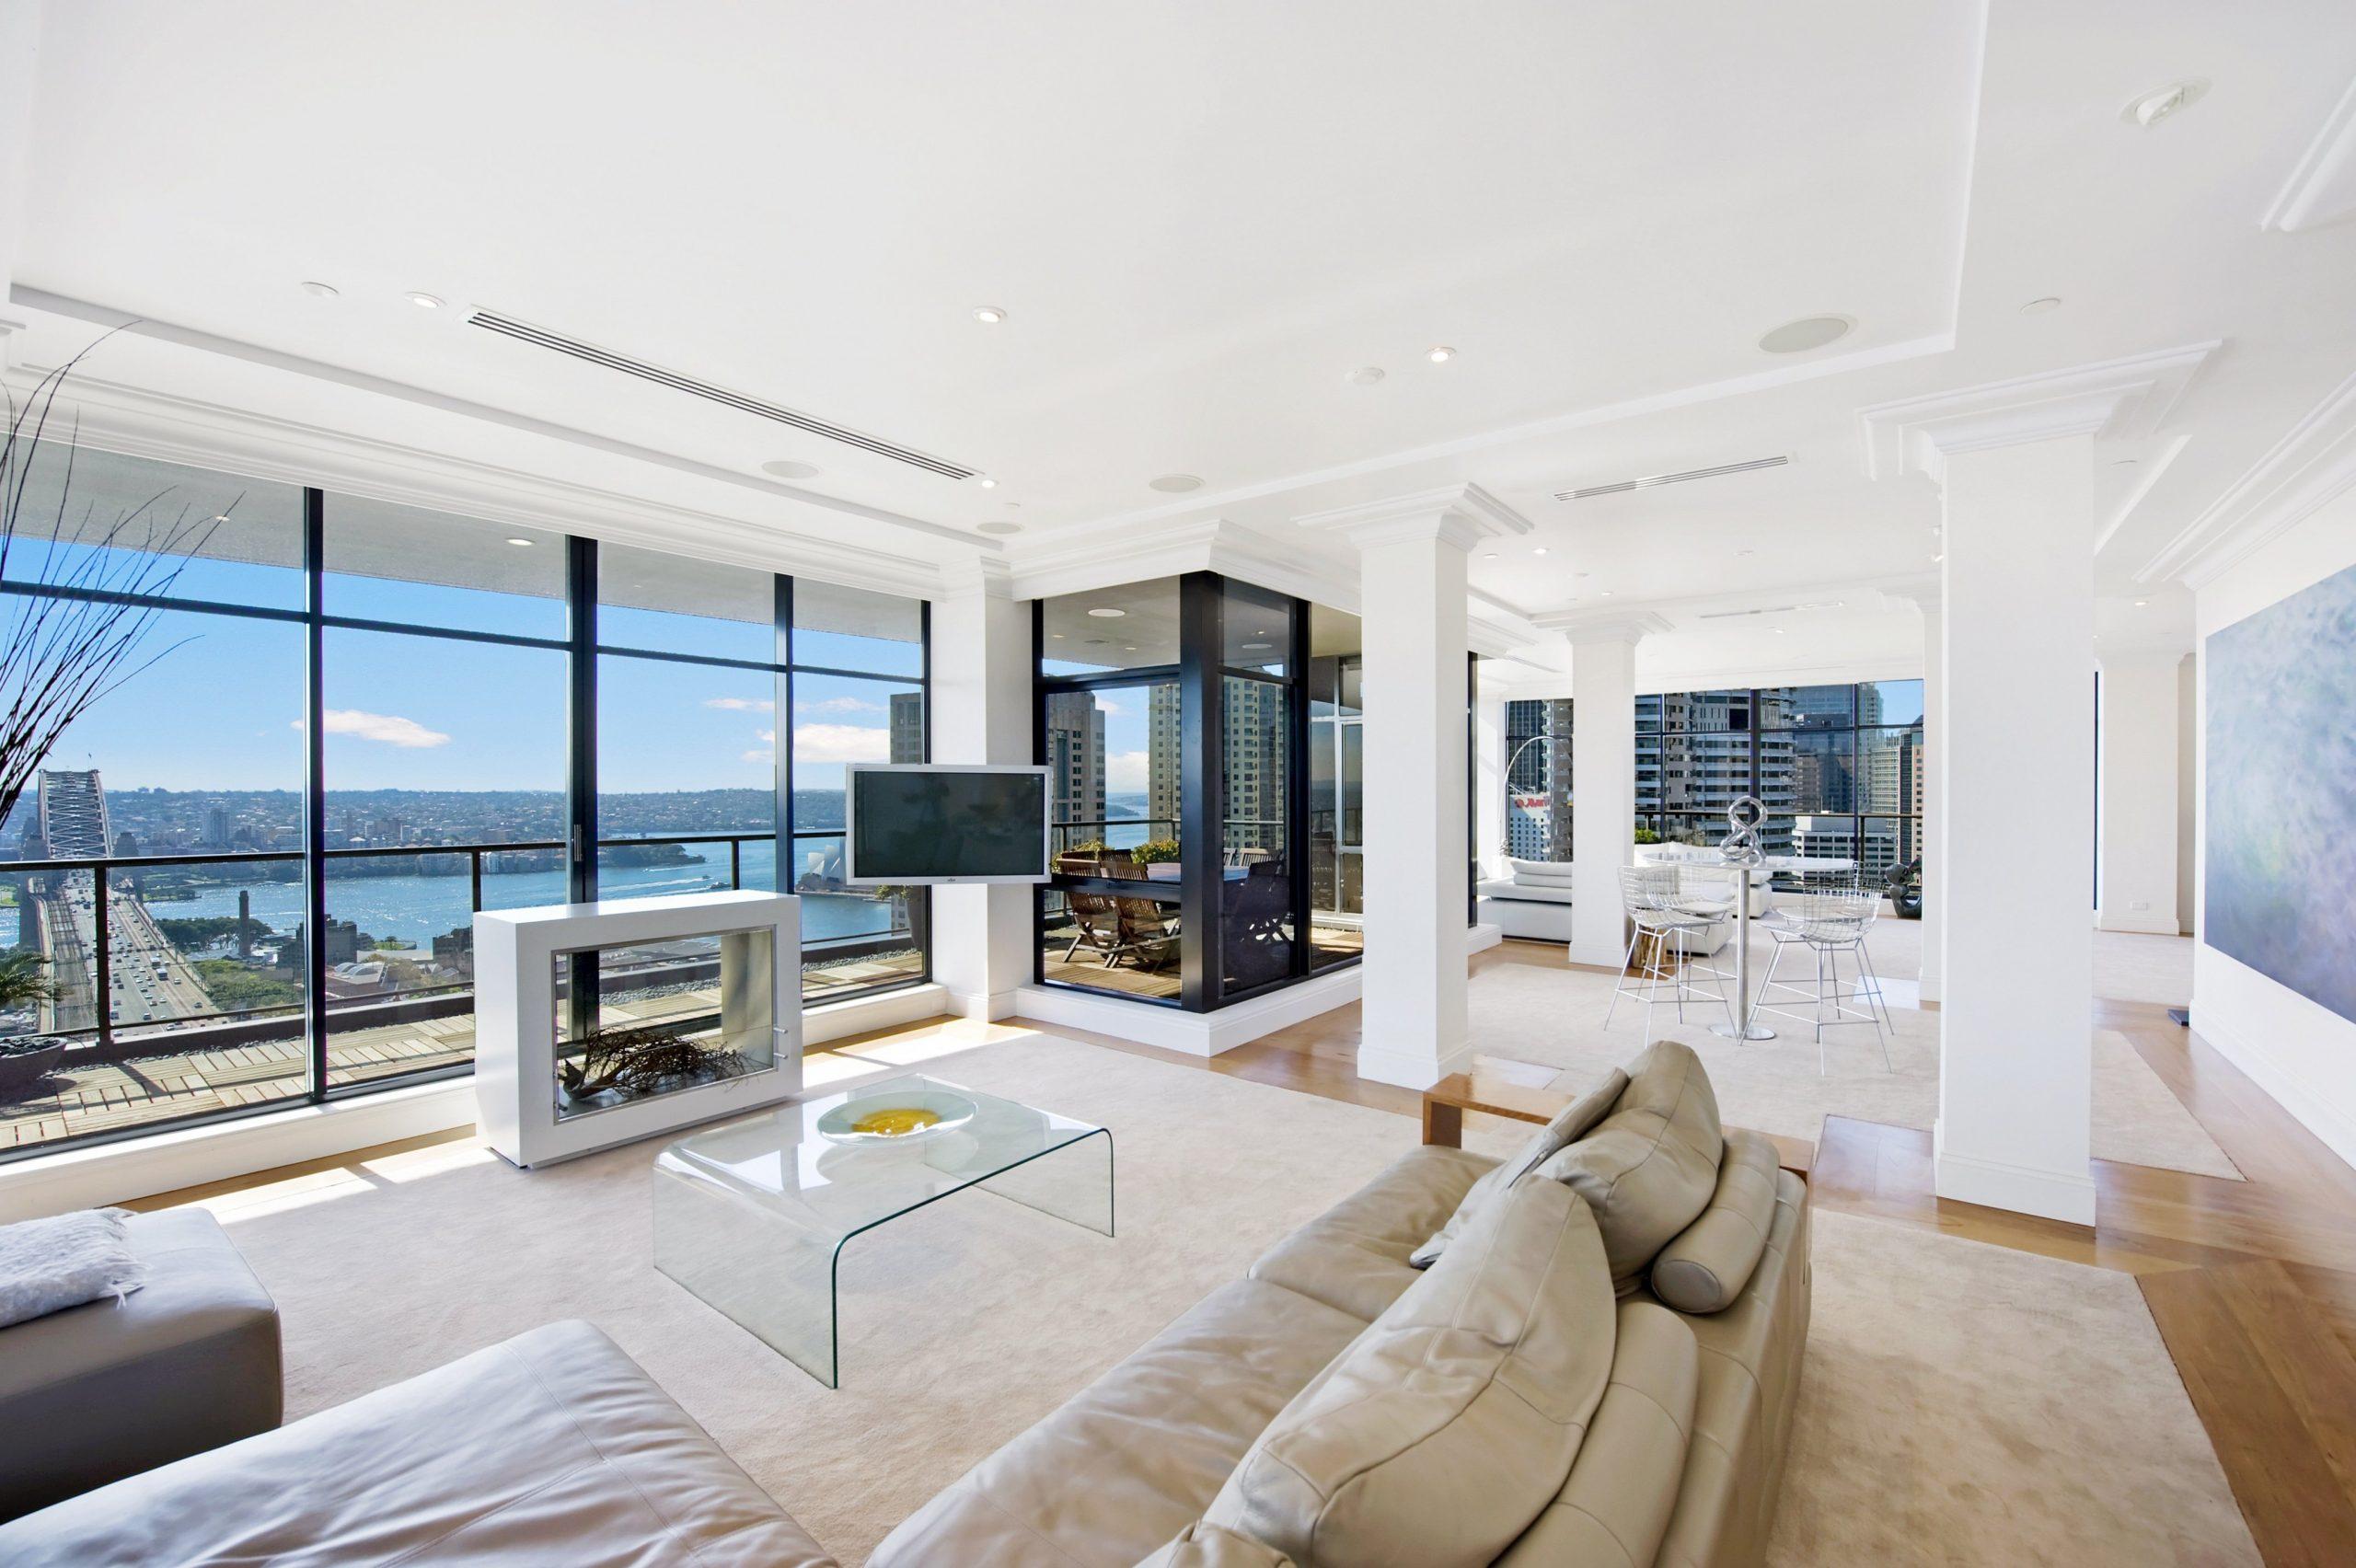 interior, Design, Room, House, Home, Apartment, Condo, 12  - Apartment Design Hd